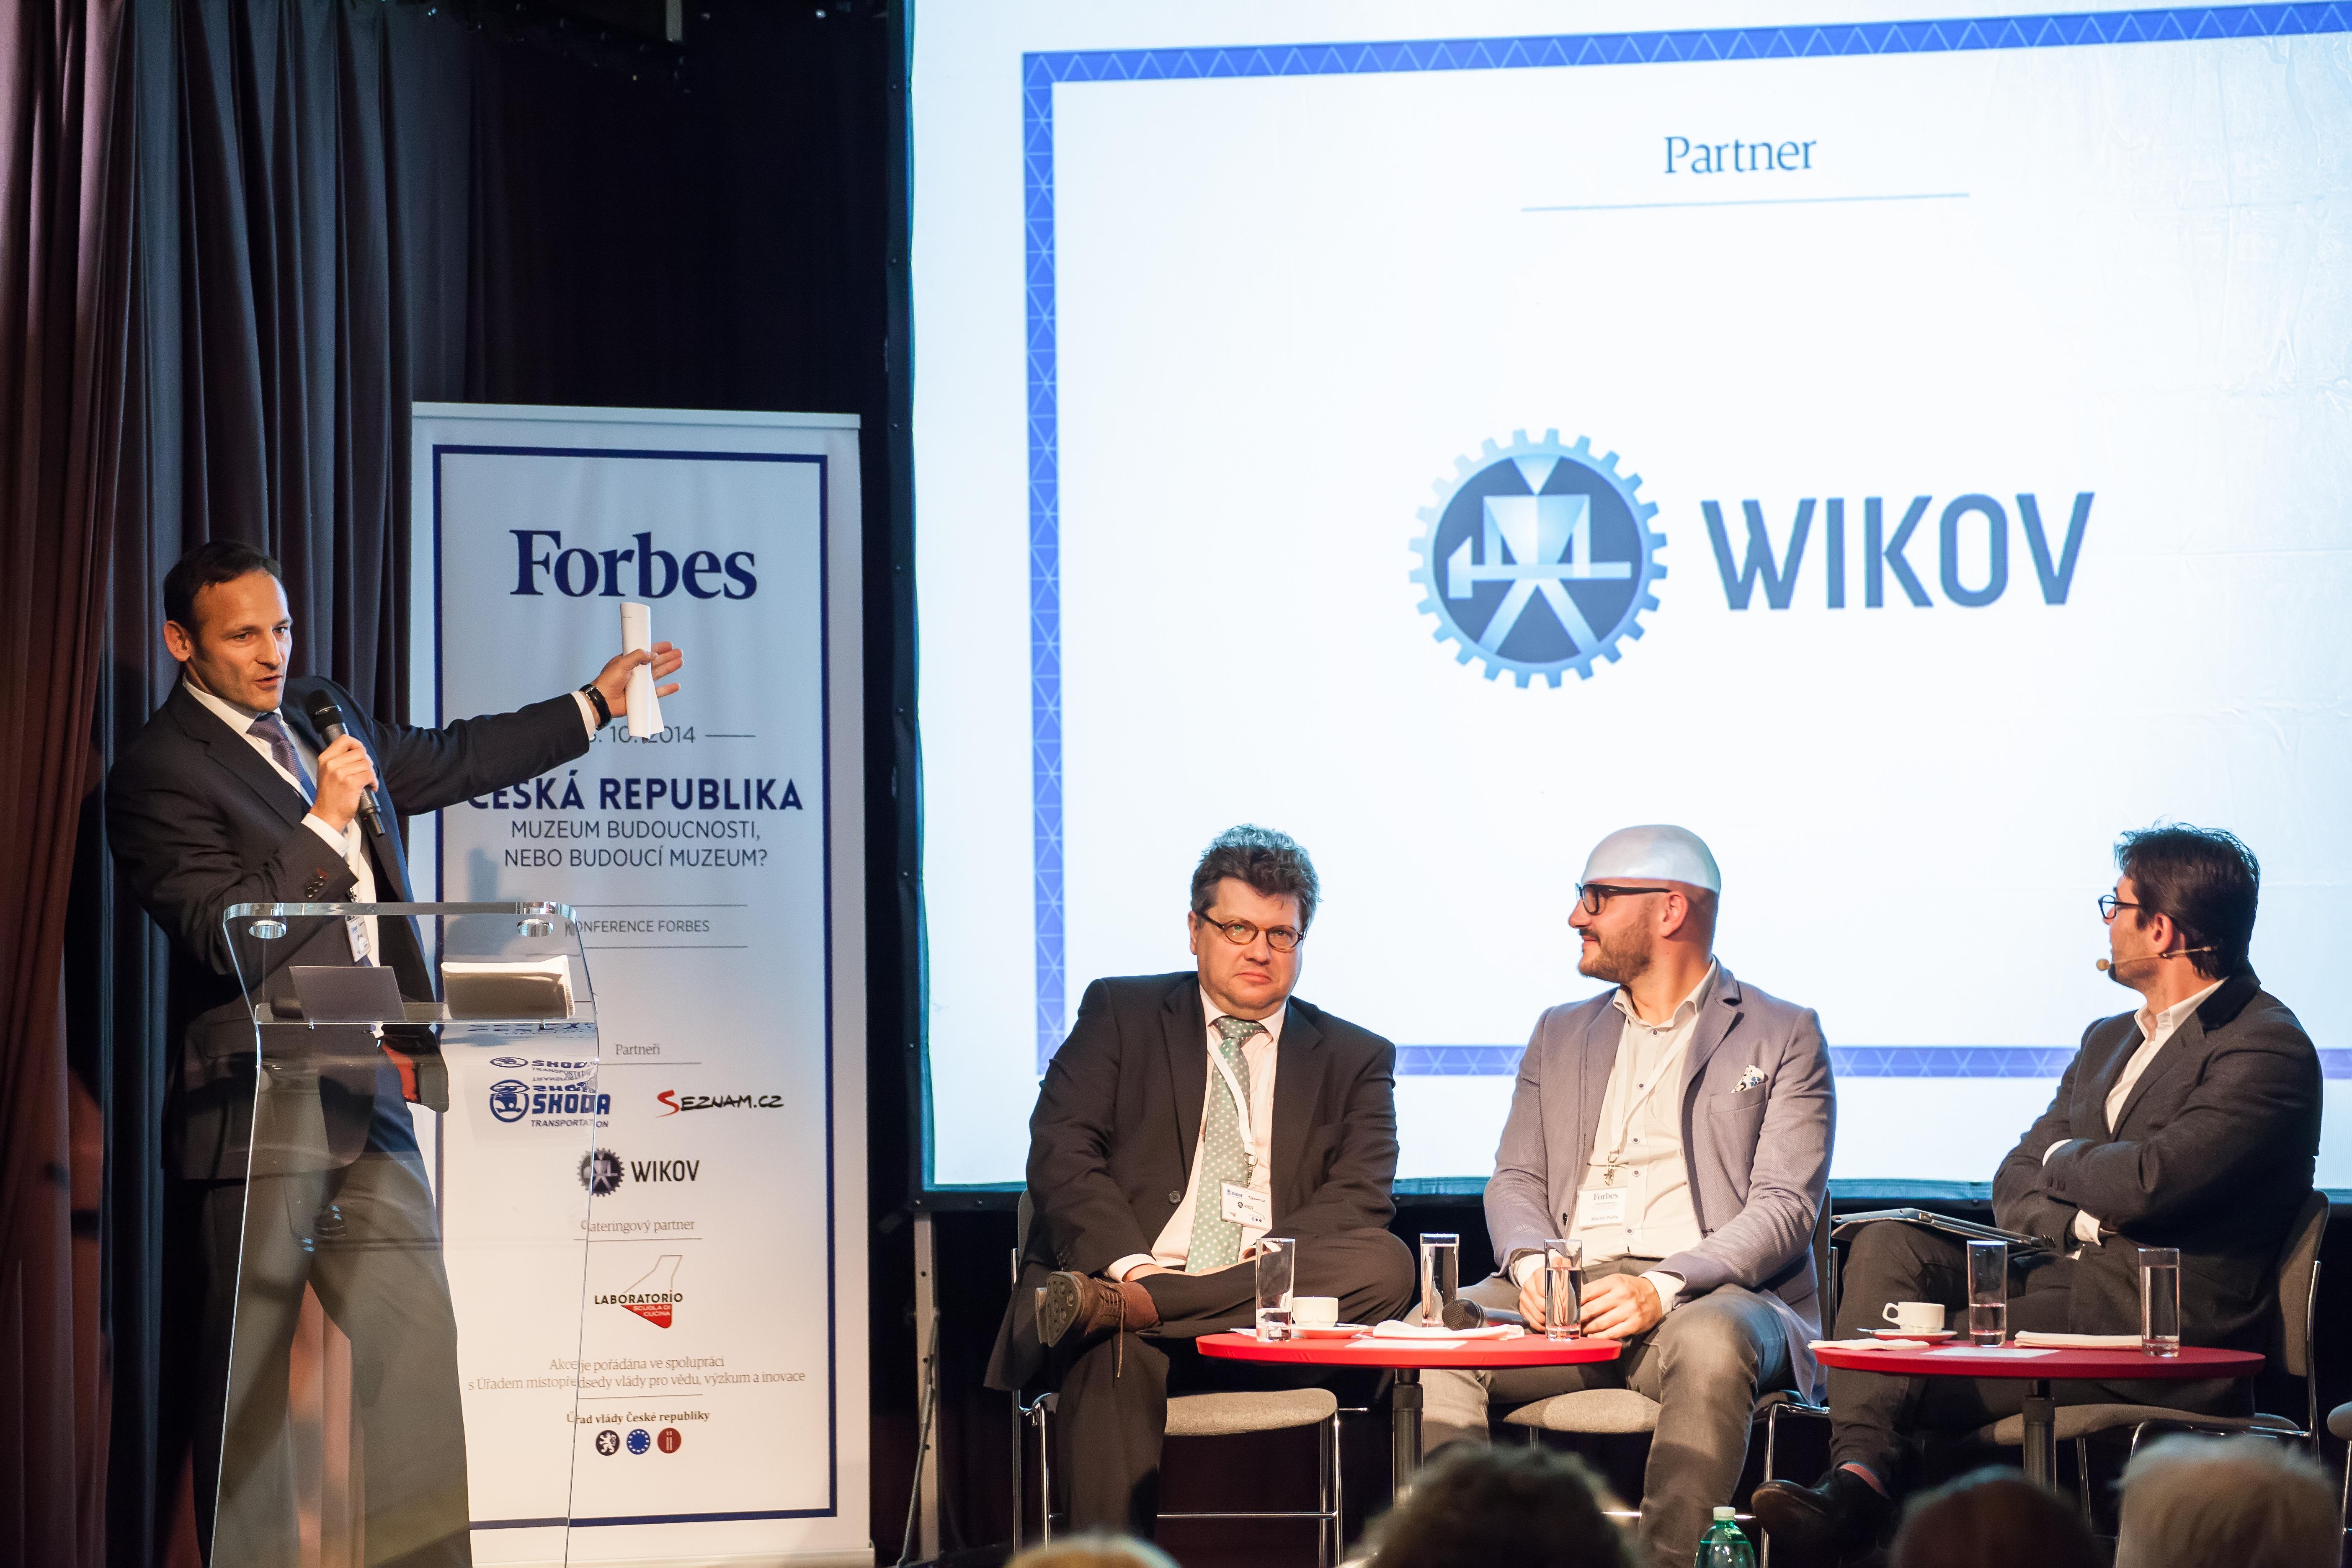 Konference Forbes 16.10.2014-81